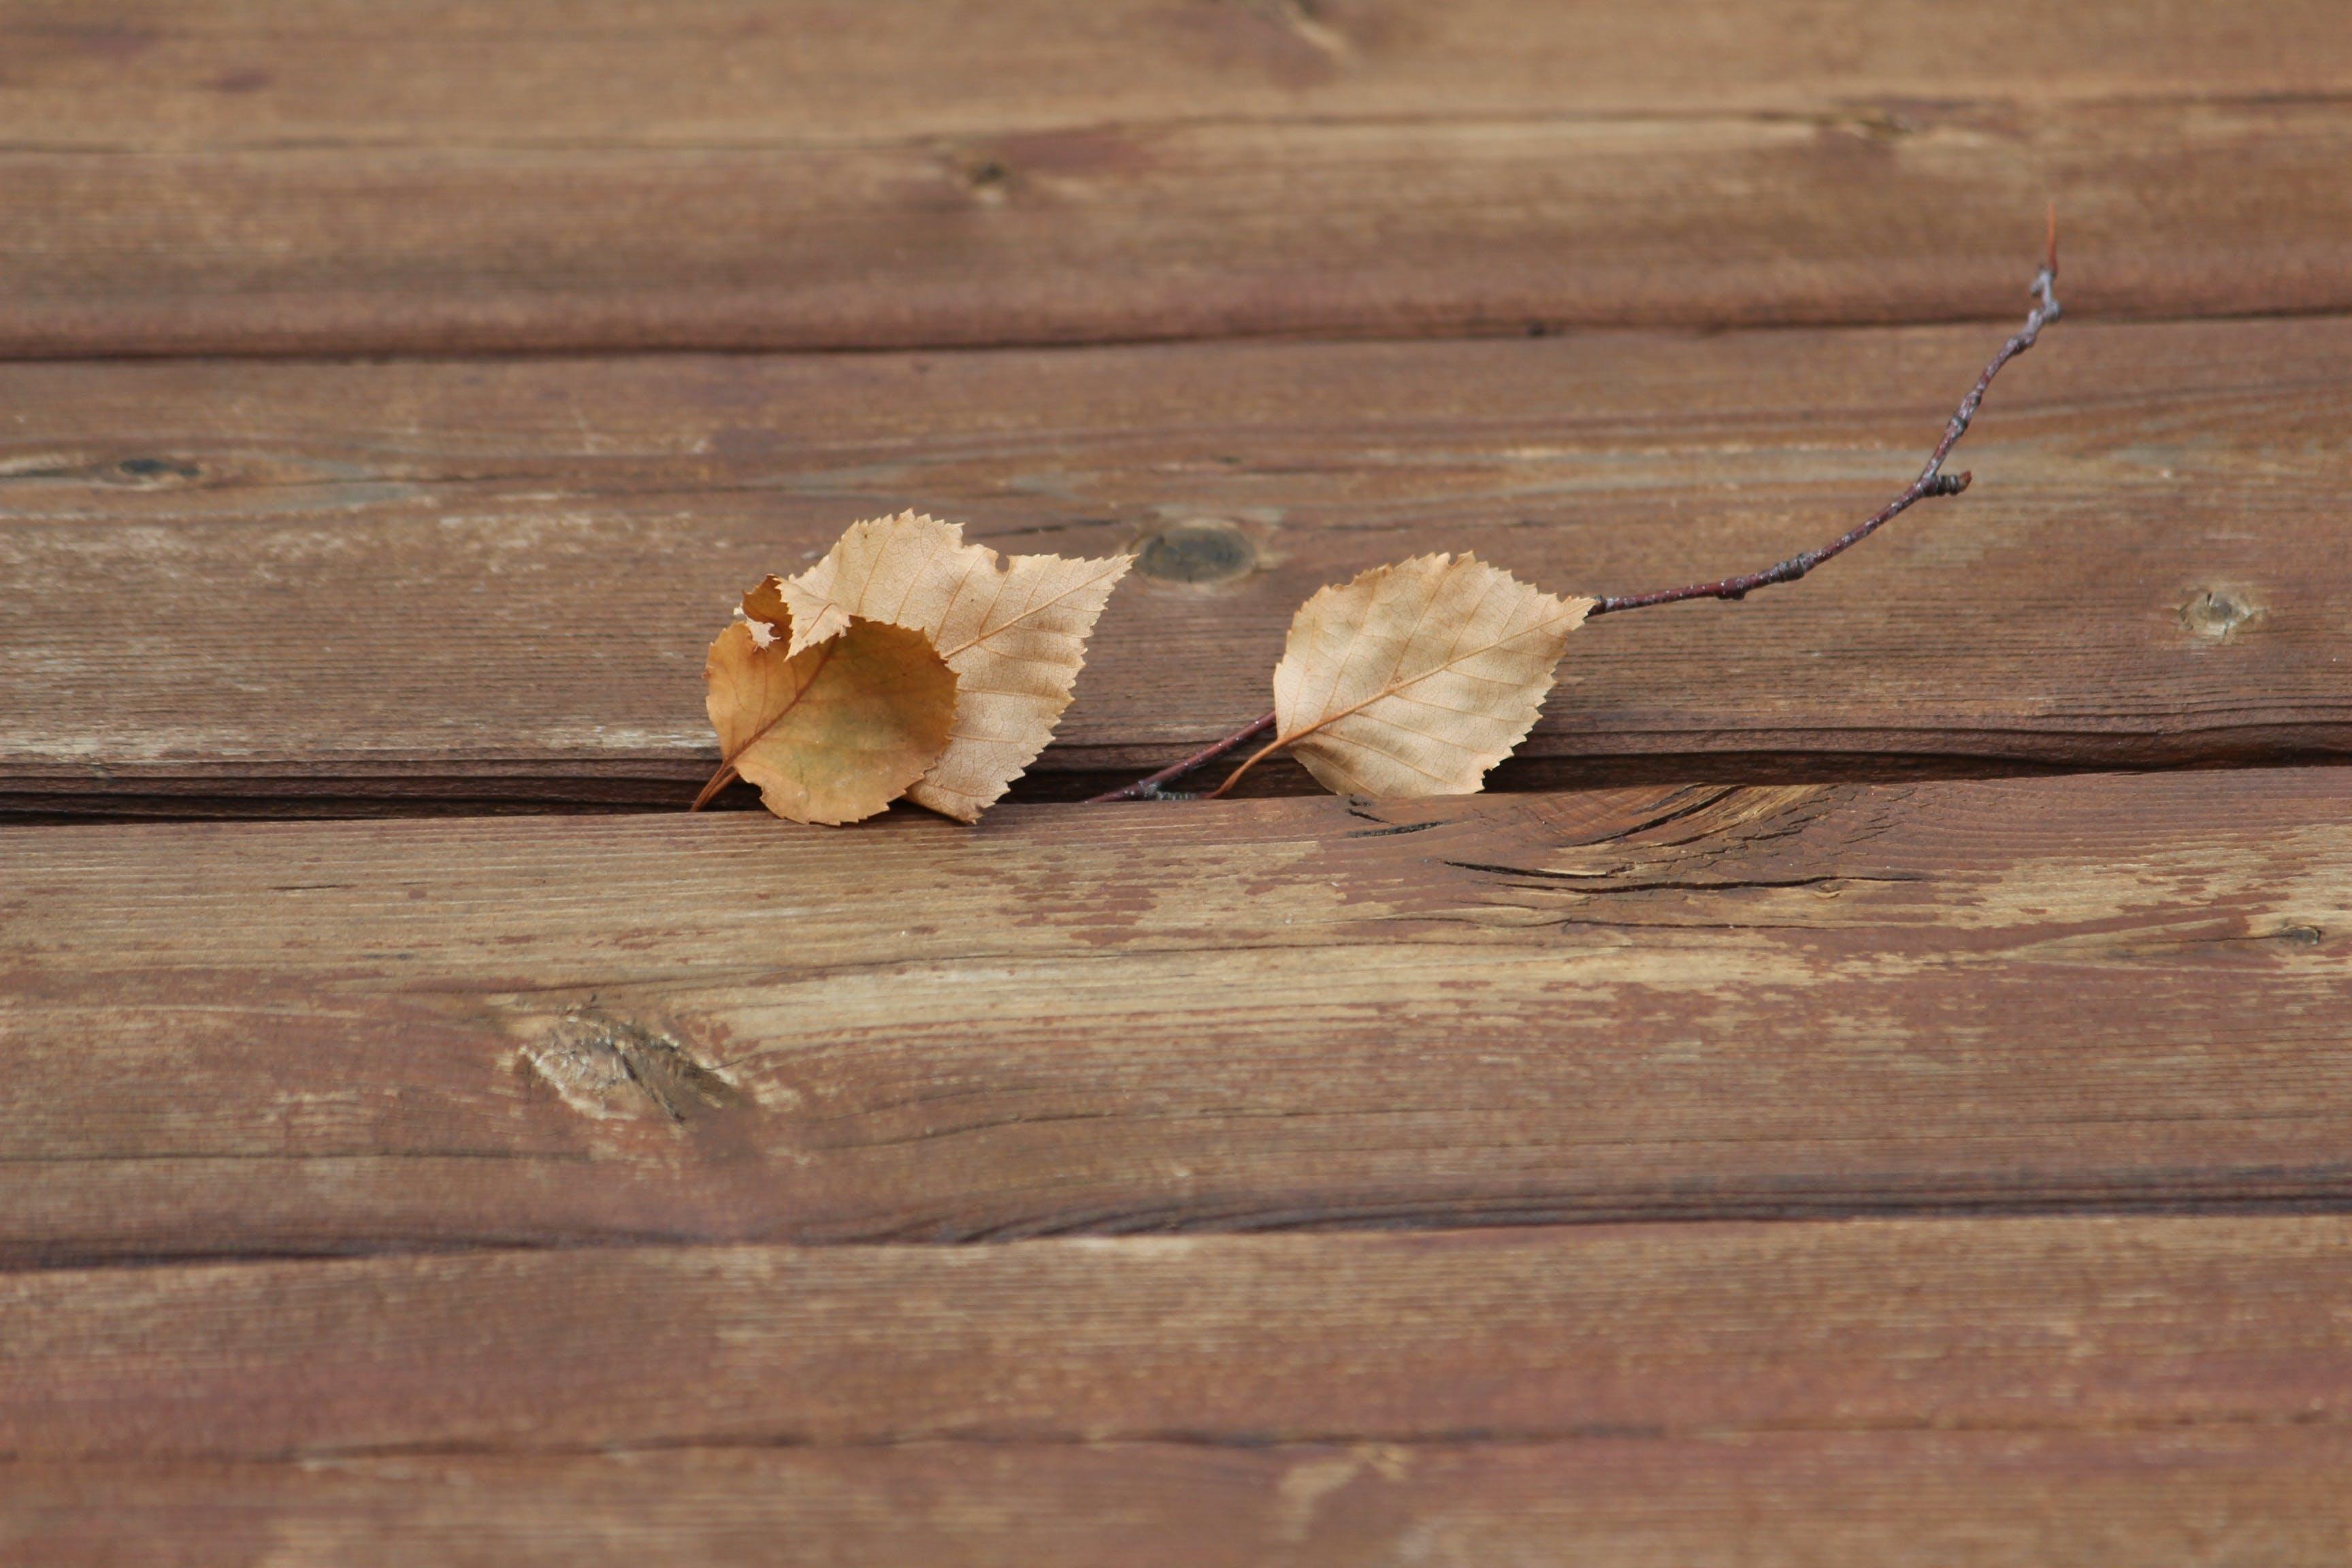 Brown Dry Leaves on Brown Wooden Plank